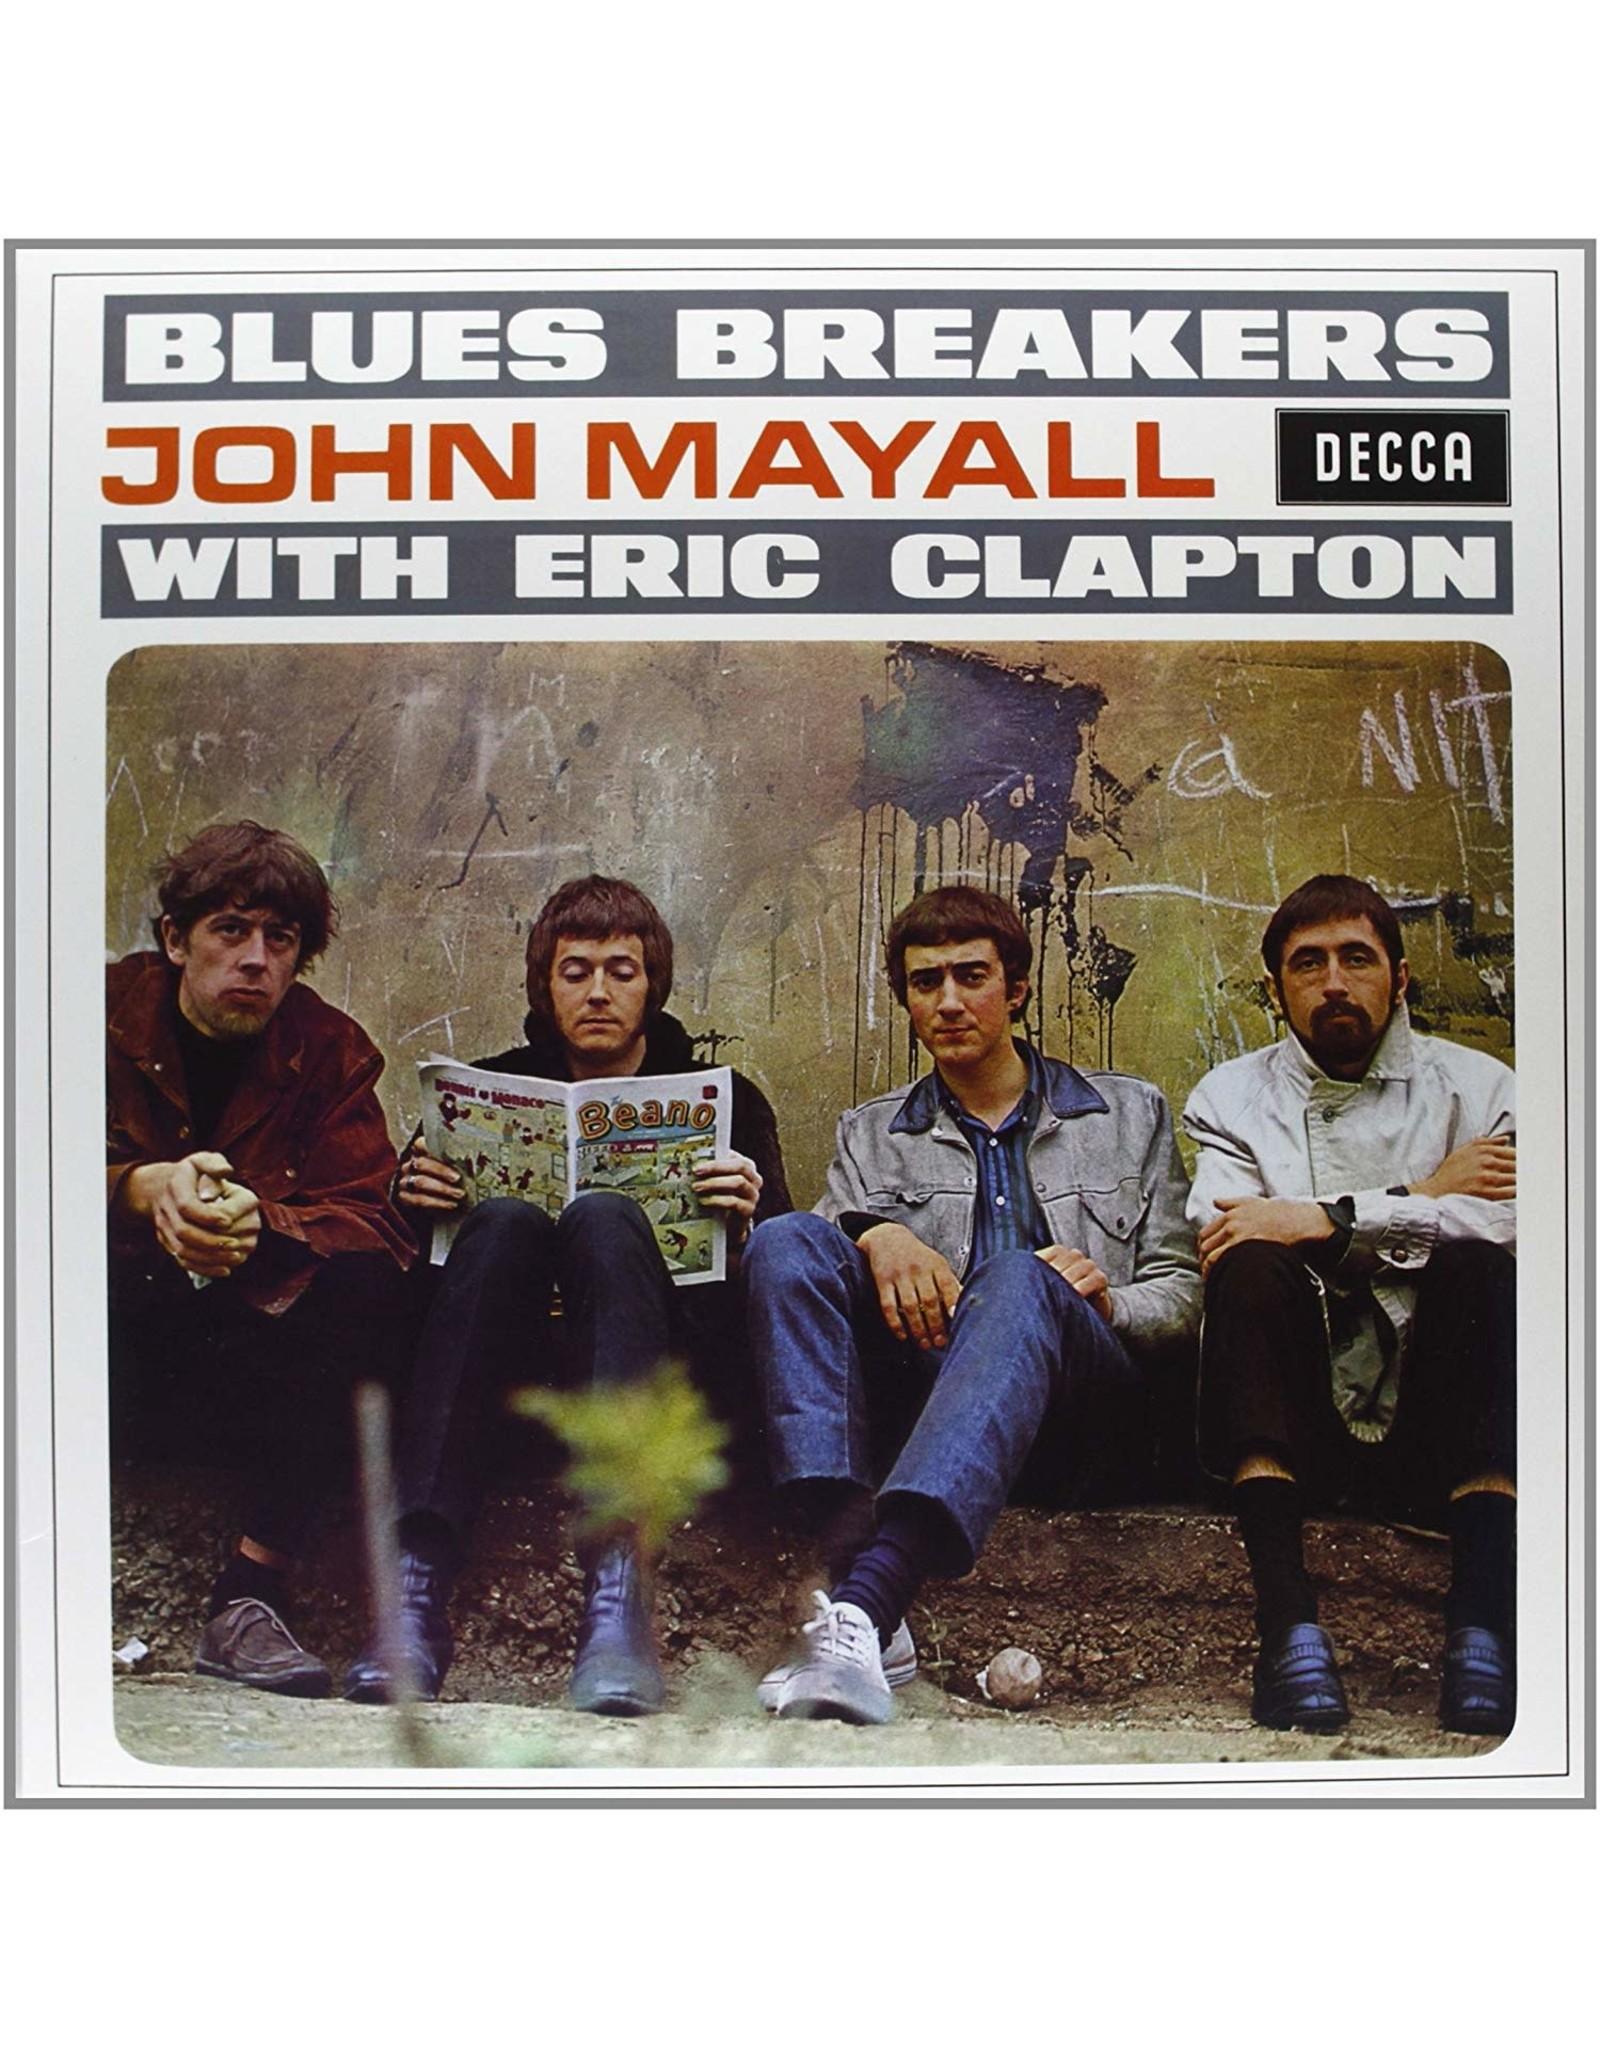 John Mayall & Eric Clapton - Blues Breakers